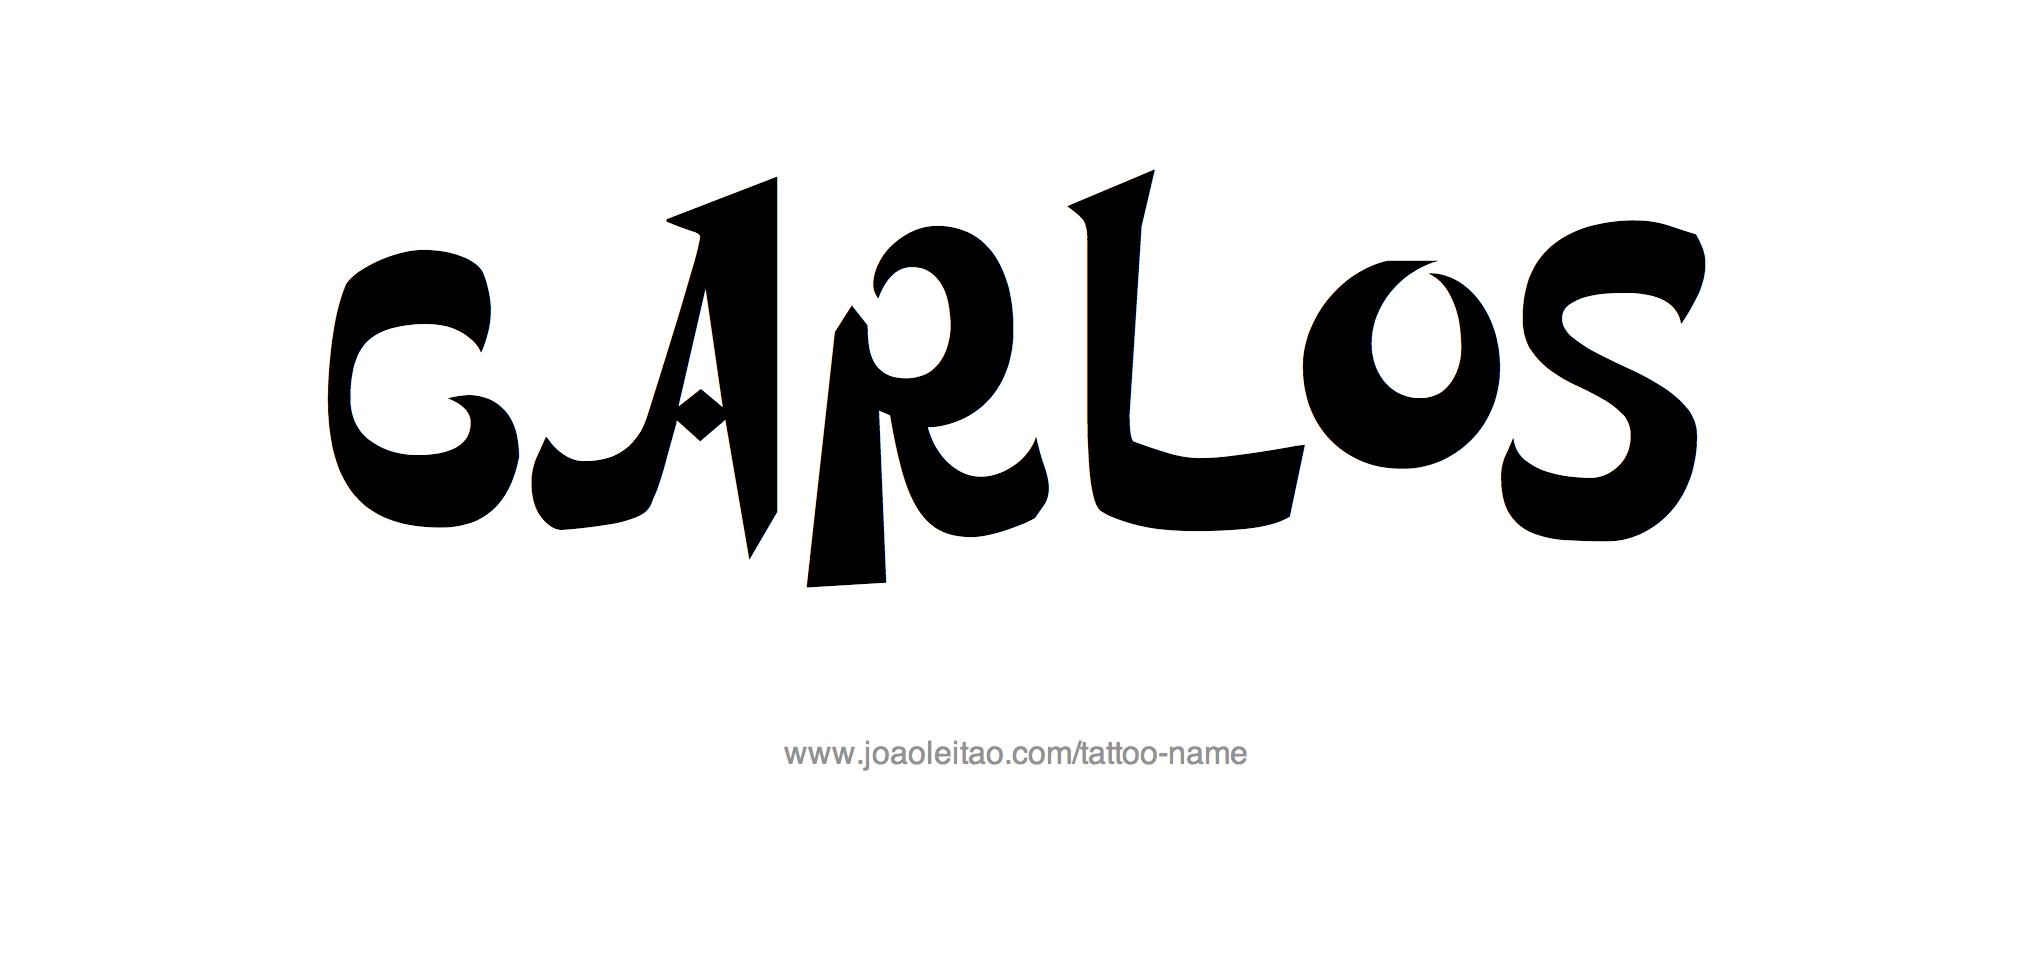 %name%: Carlos Name Tattoo Designs